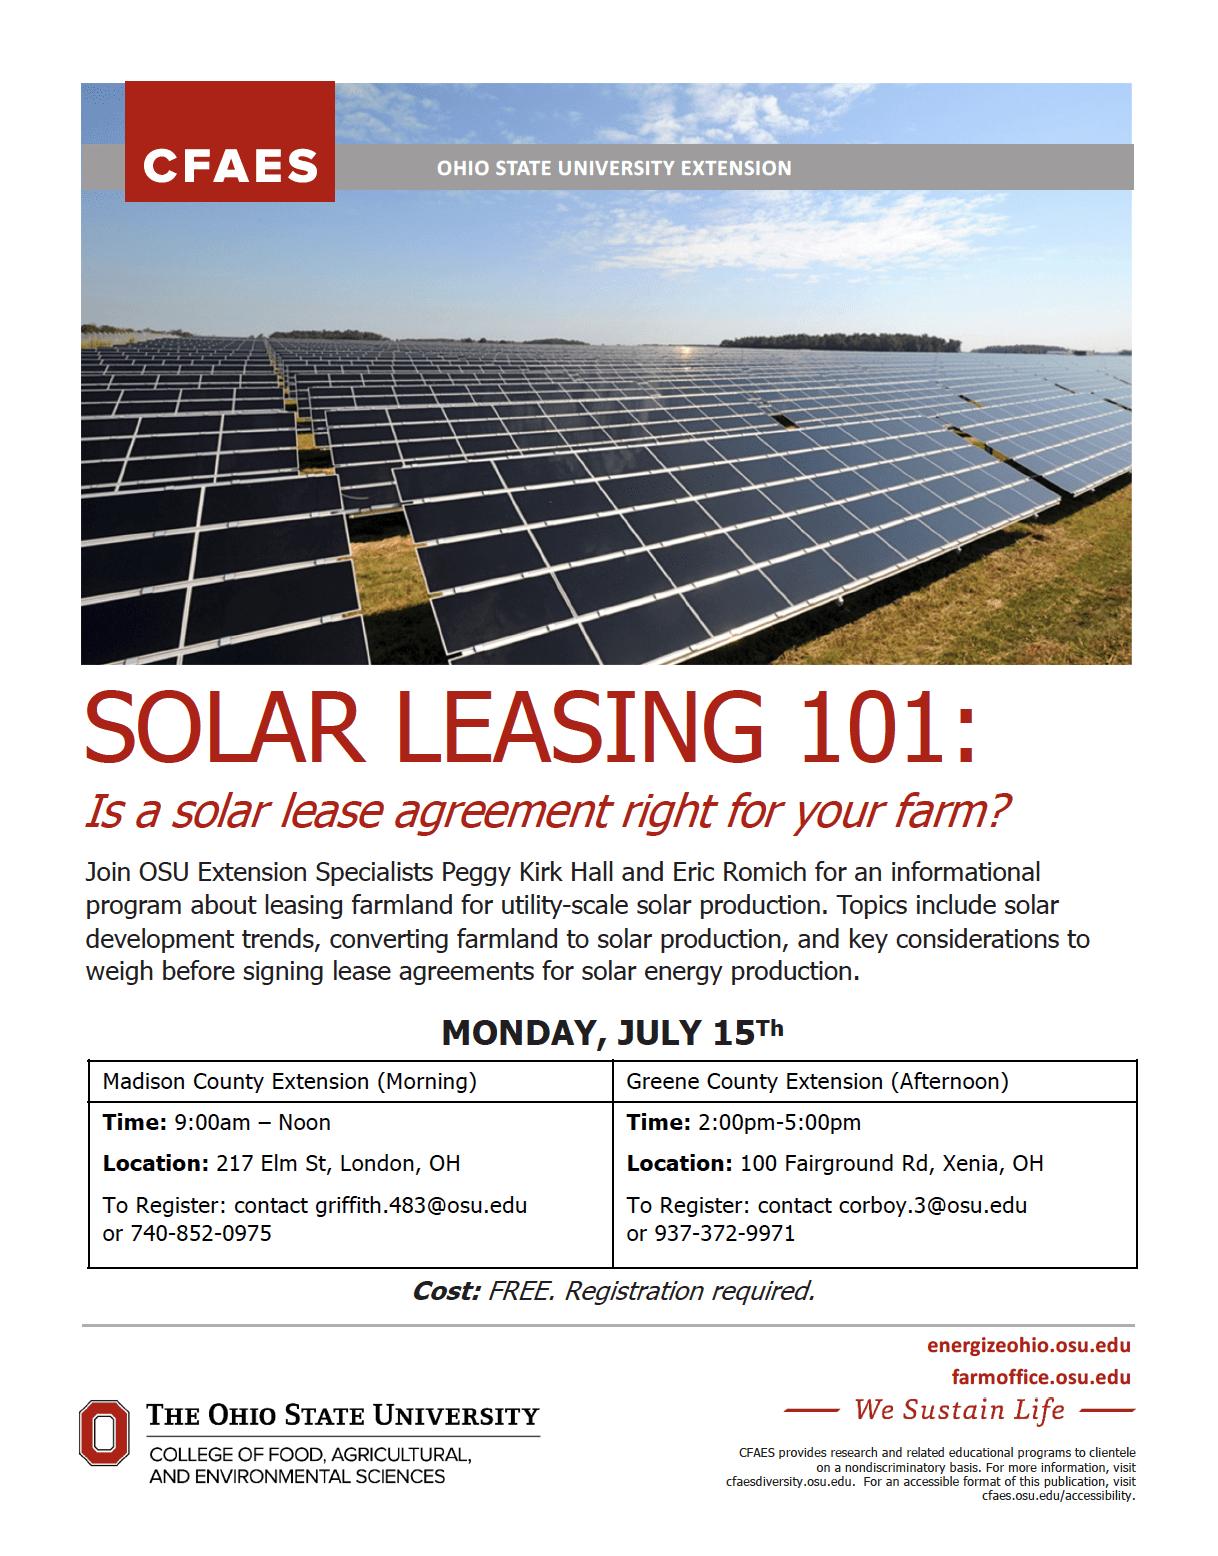 Solar Leasing 101 July 15 Osu Extension Greene County